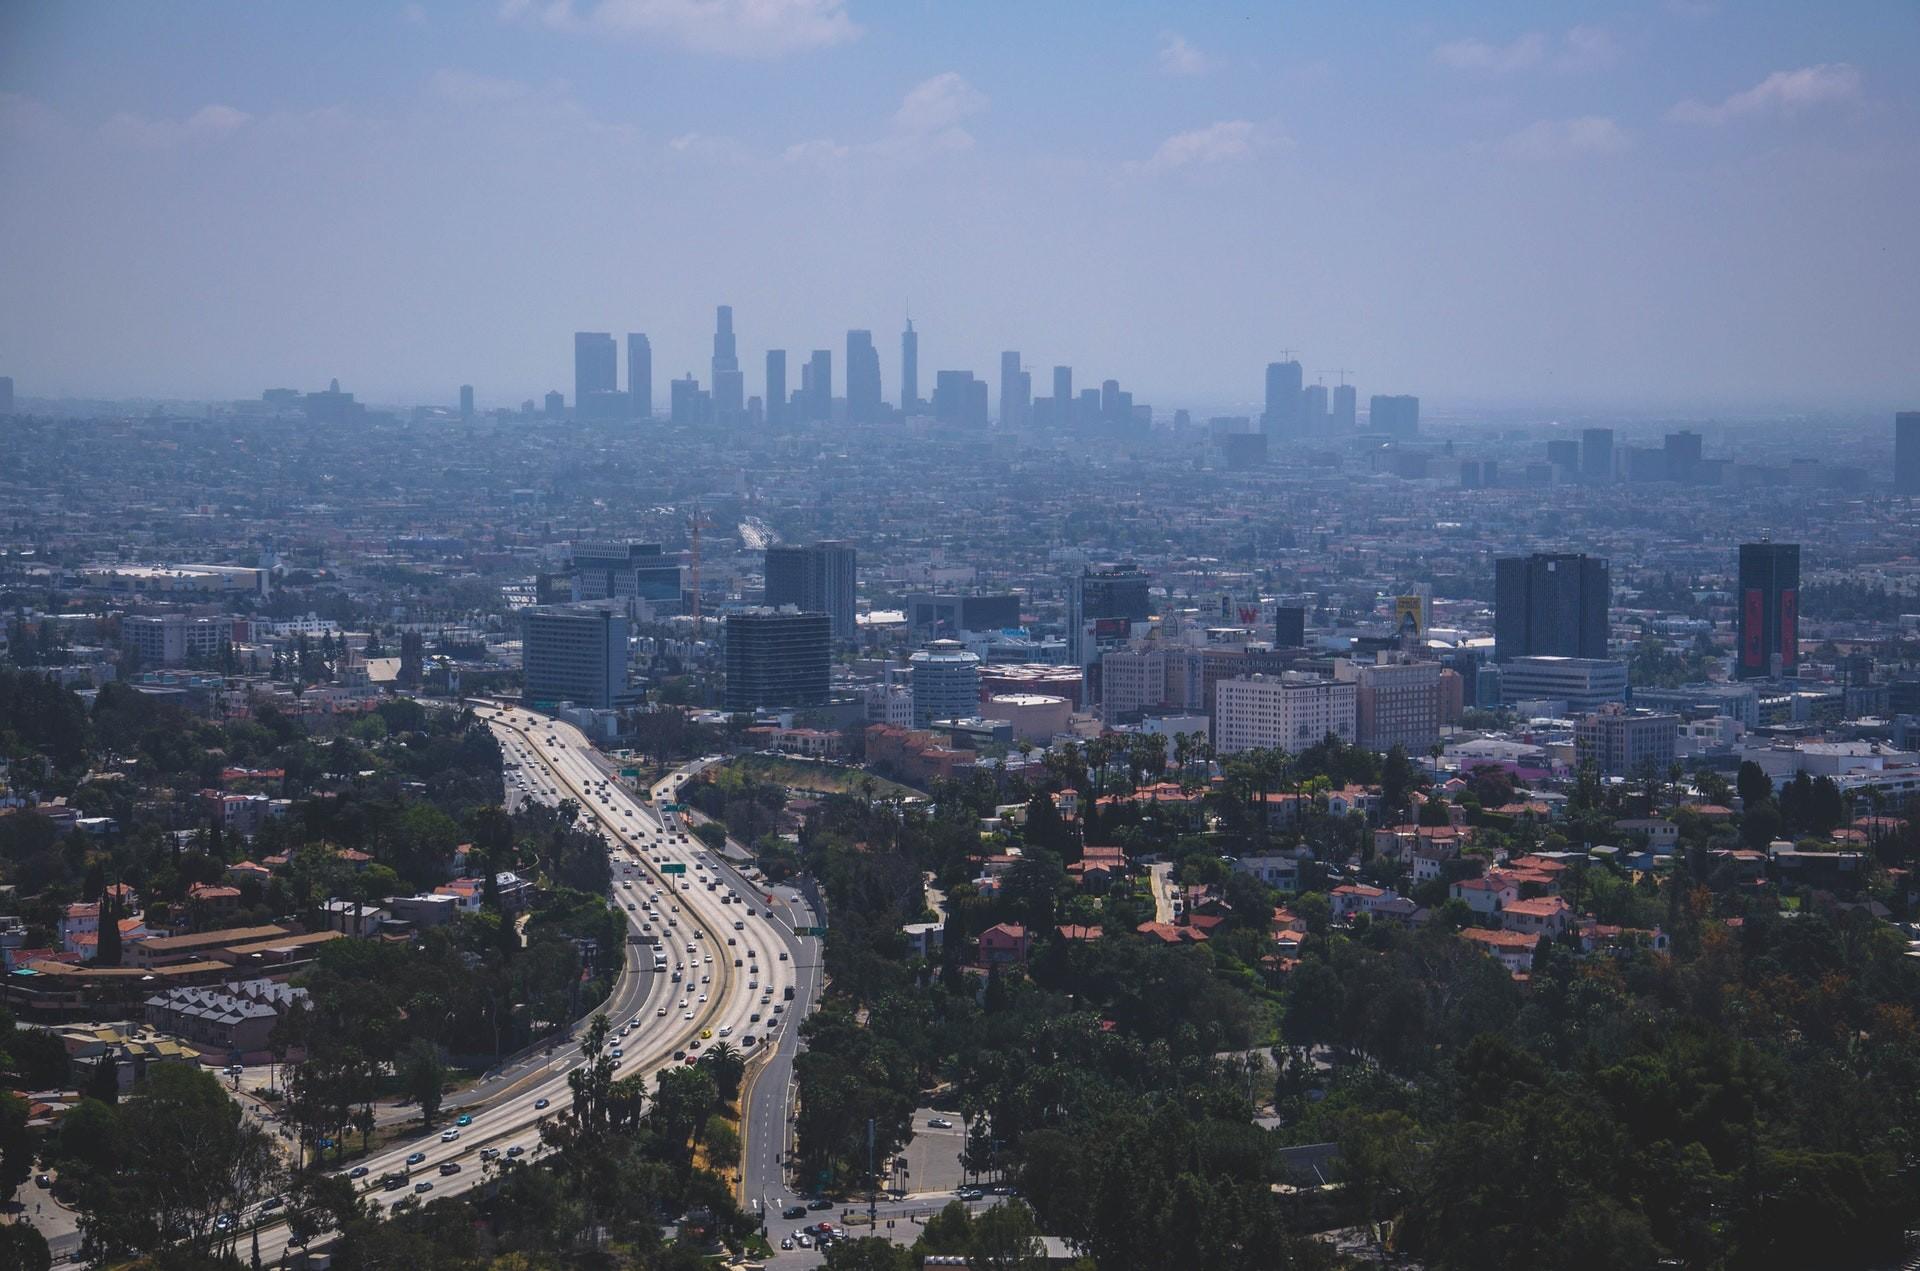 Los Angeles city space